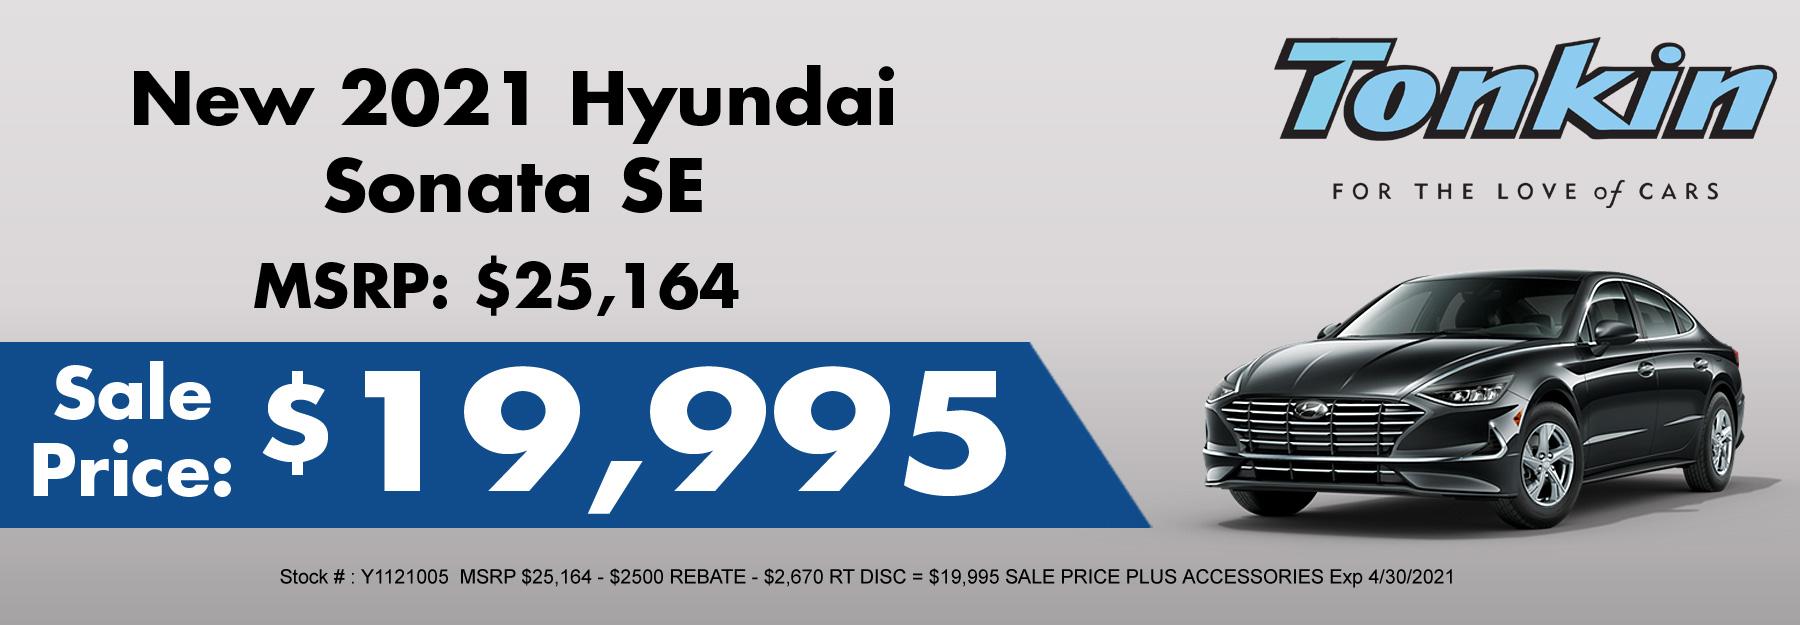 Hyundai Sonata Retail Special